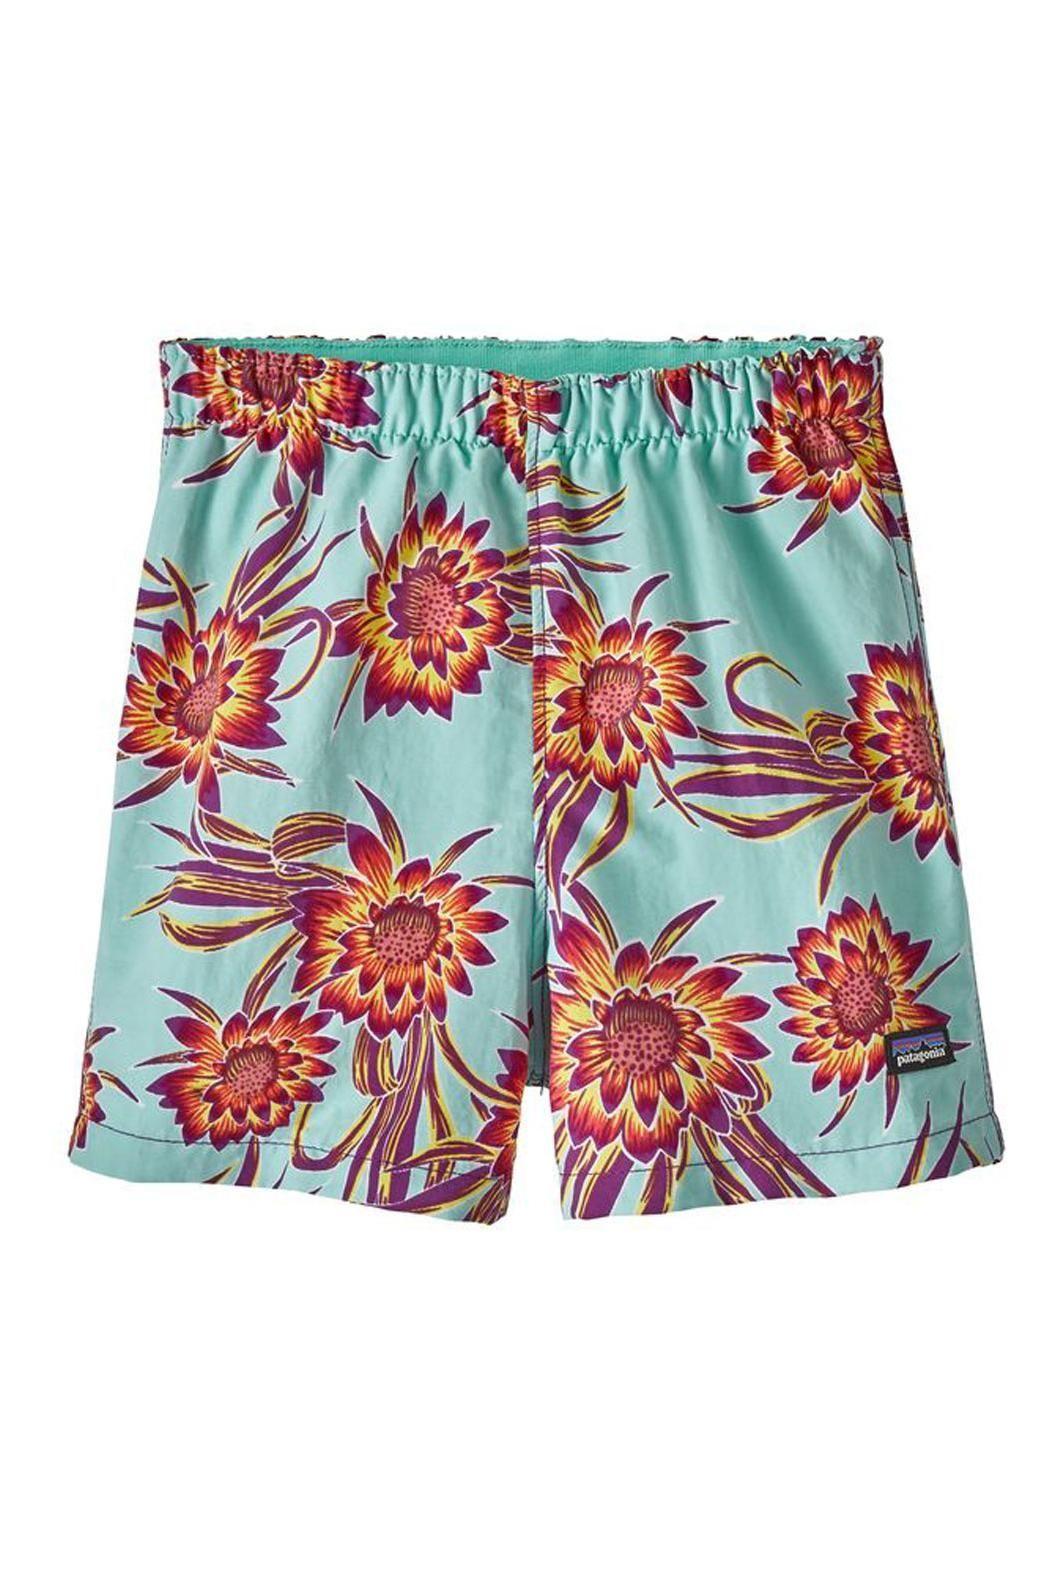 5dd07296e1 Baby Baggies Shorts | Baby Girl Swim | Shorts, Baby, Swim trunks